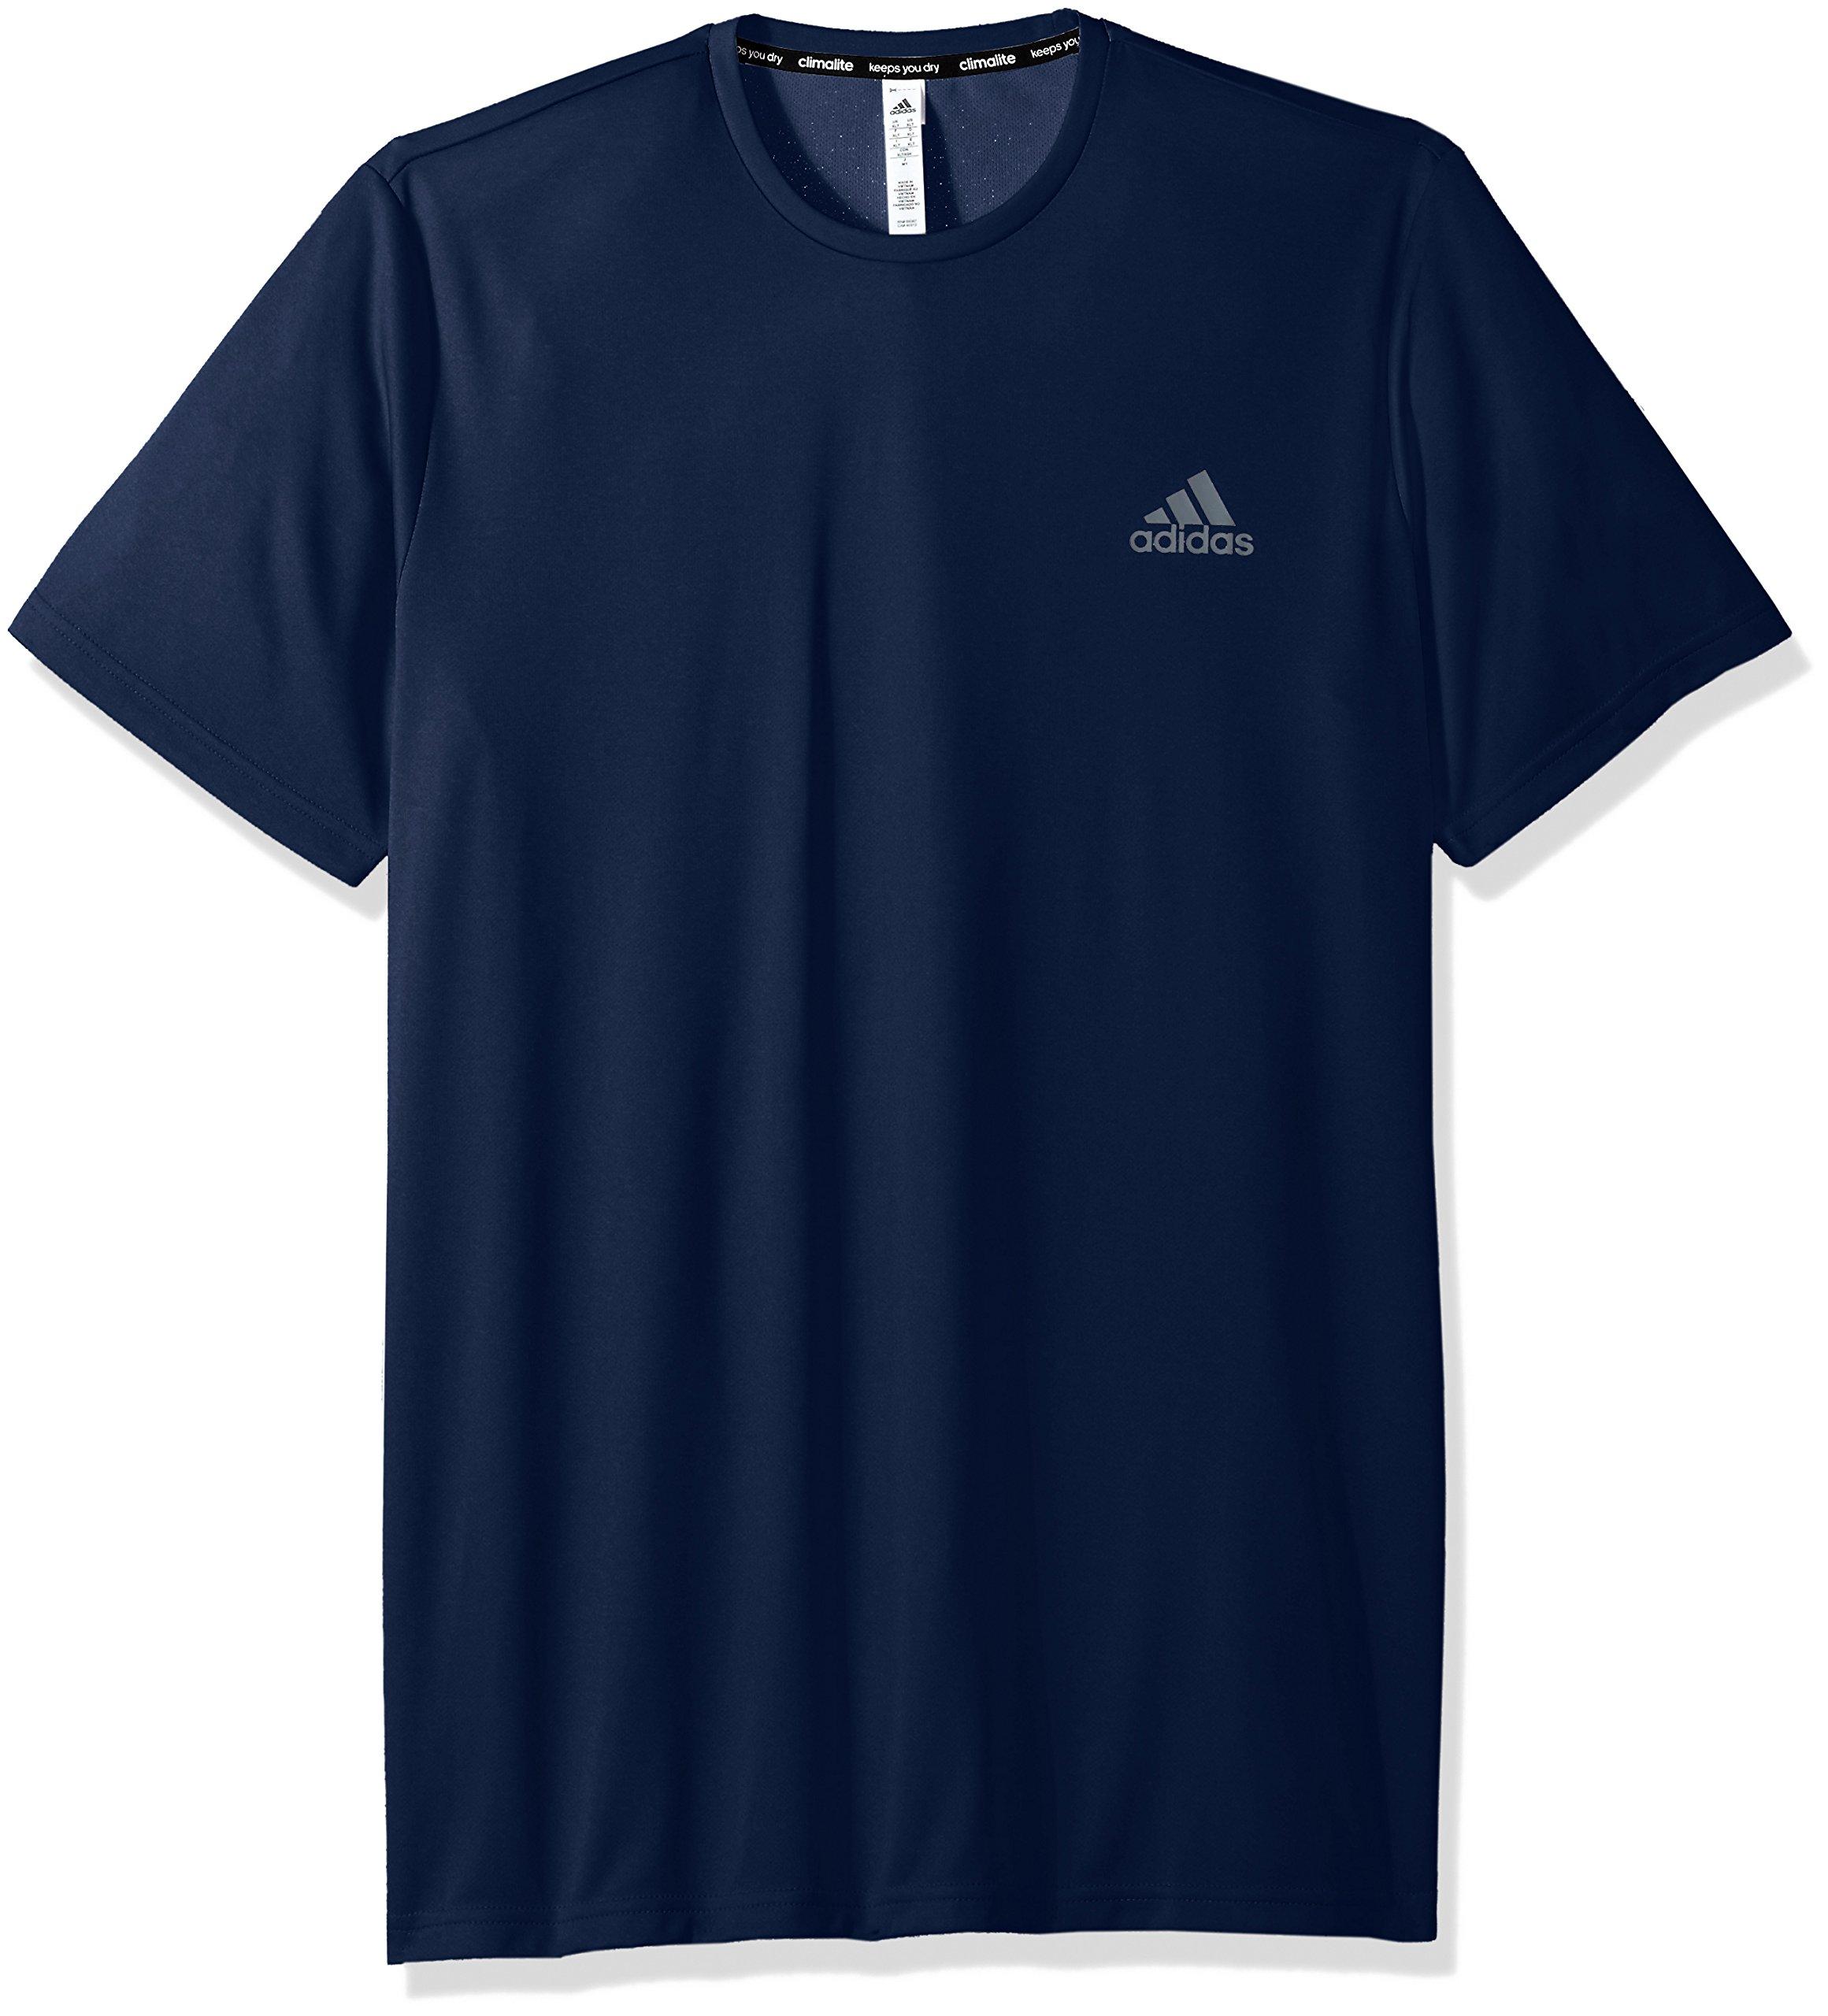 adidas Men's Essentials Tech Big & Tall Tee, Collegiate Navy, 3X-Large Tall